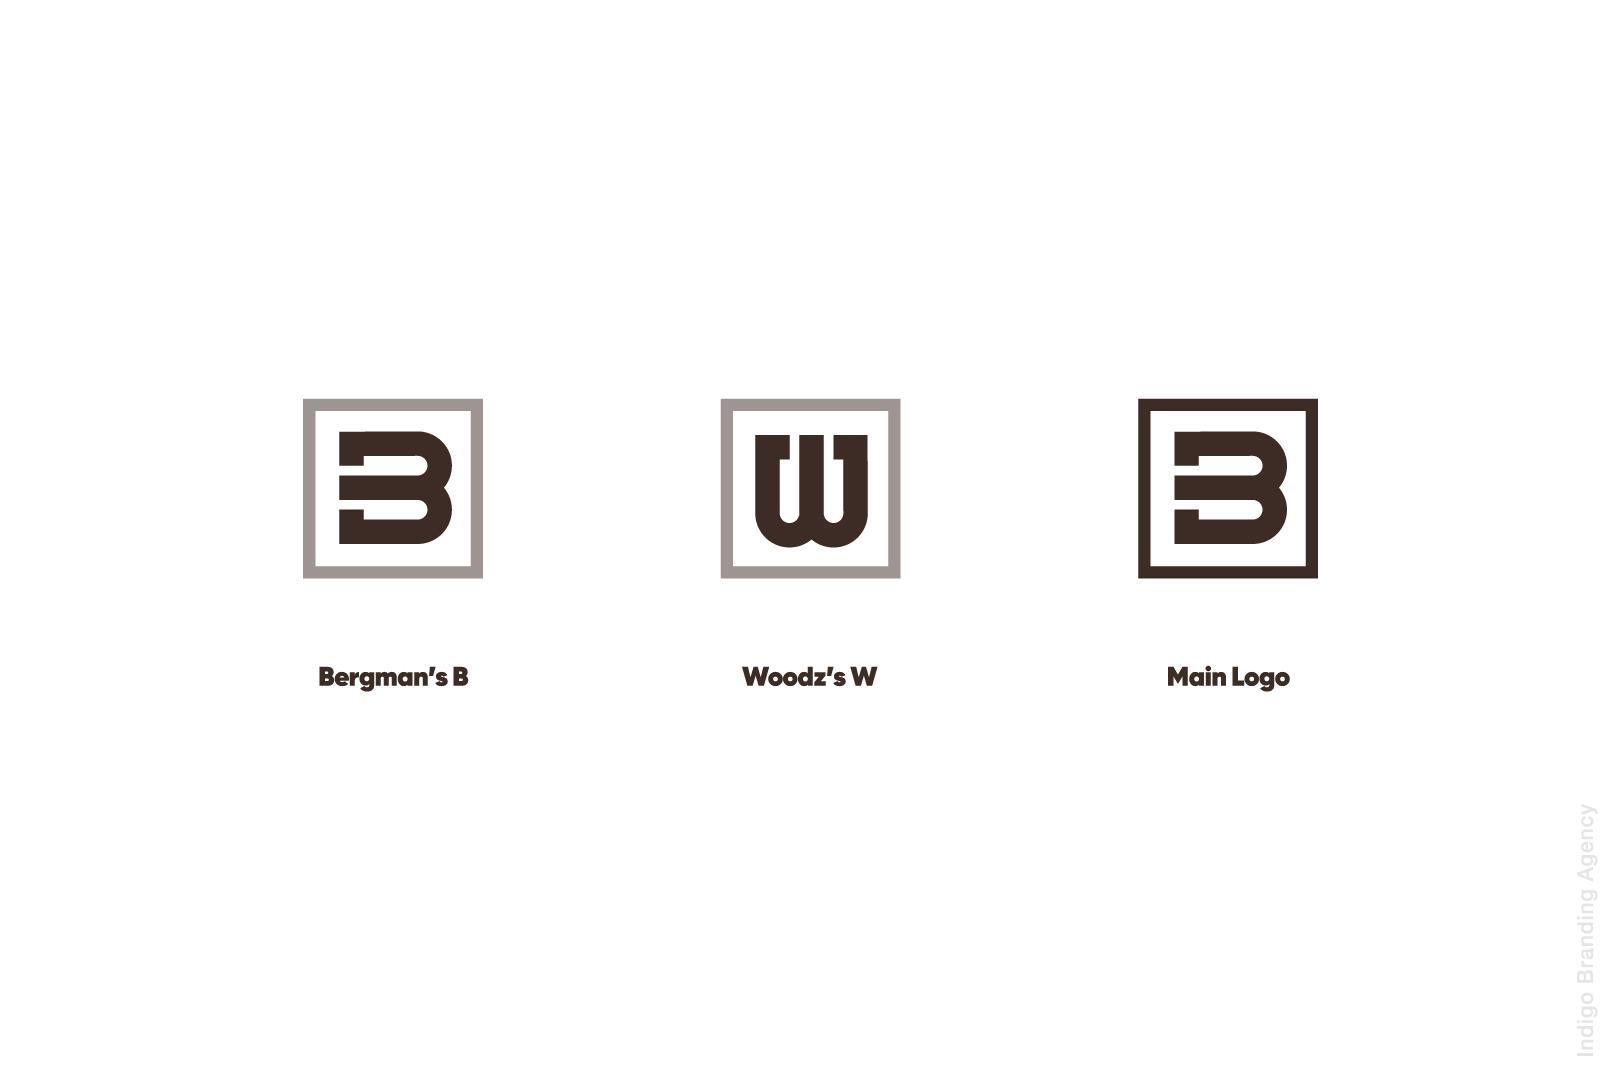 bergman woodz furniture production design wood branding logo design naming indigo branding quality furniture letter b letter W in logo construction